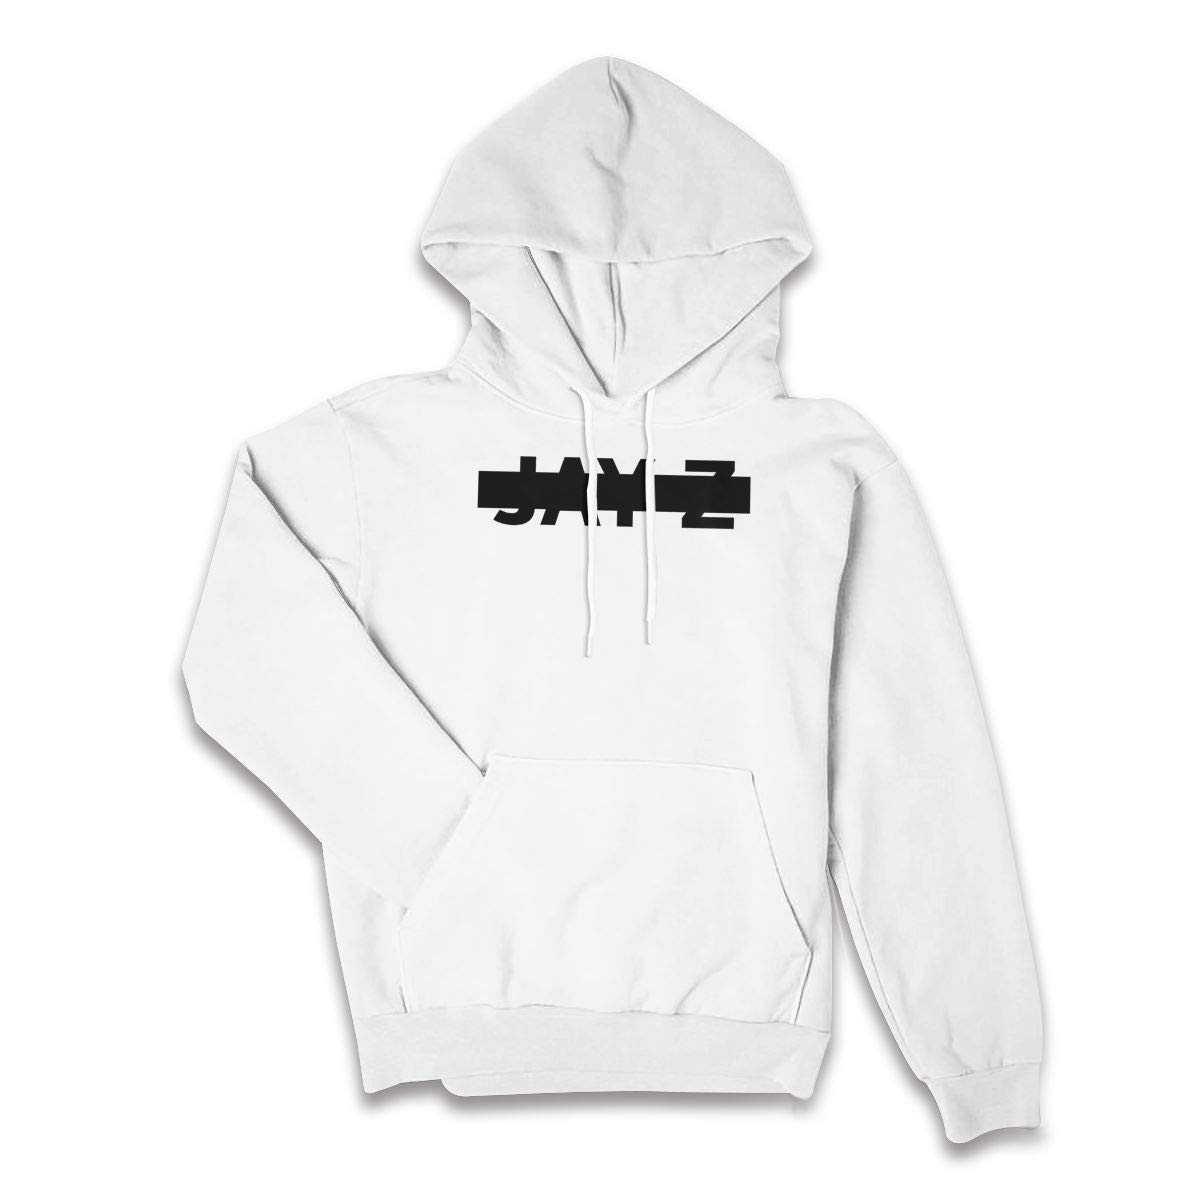 Ofctthlinw Jay Z Logo Fashion Hoody 5592 Shirts